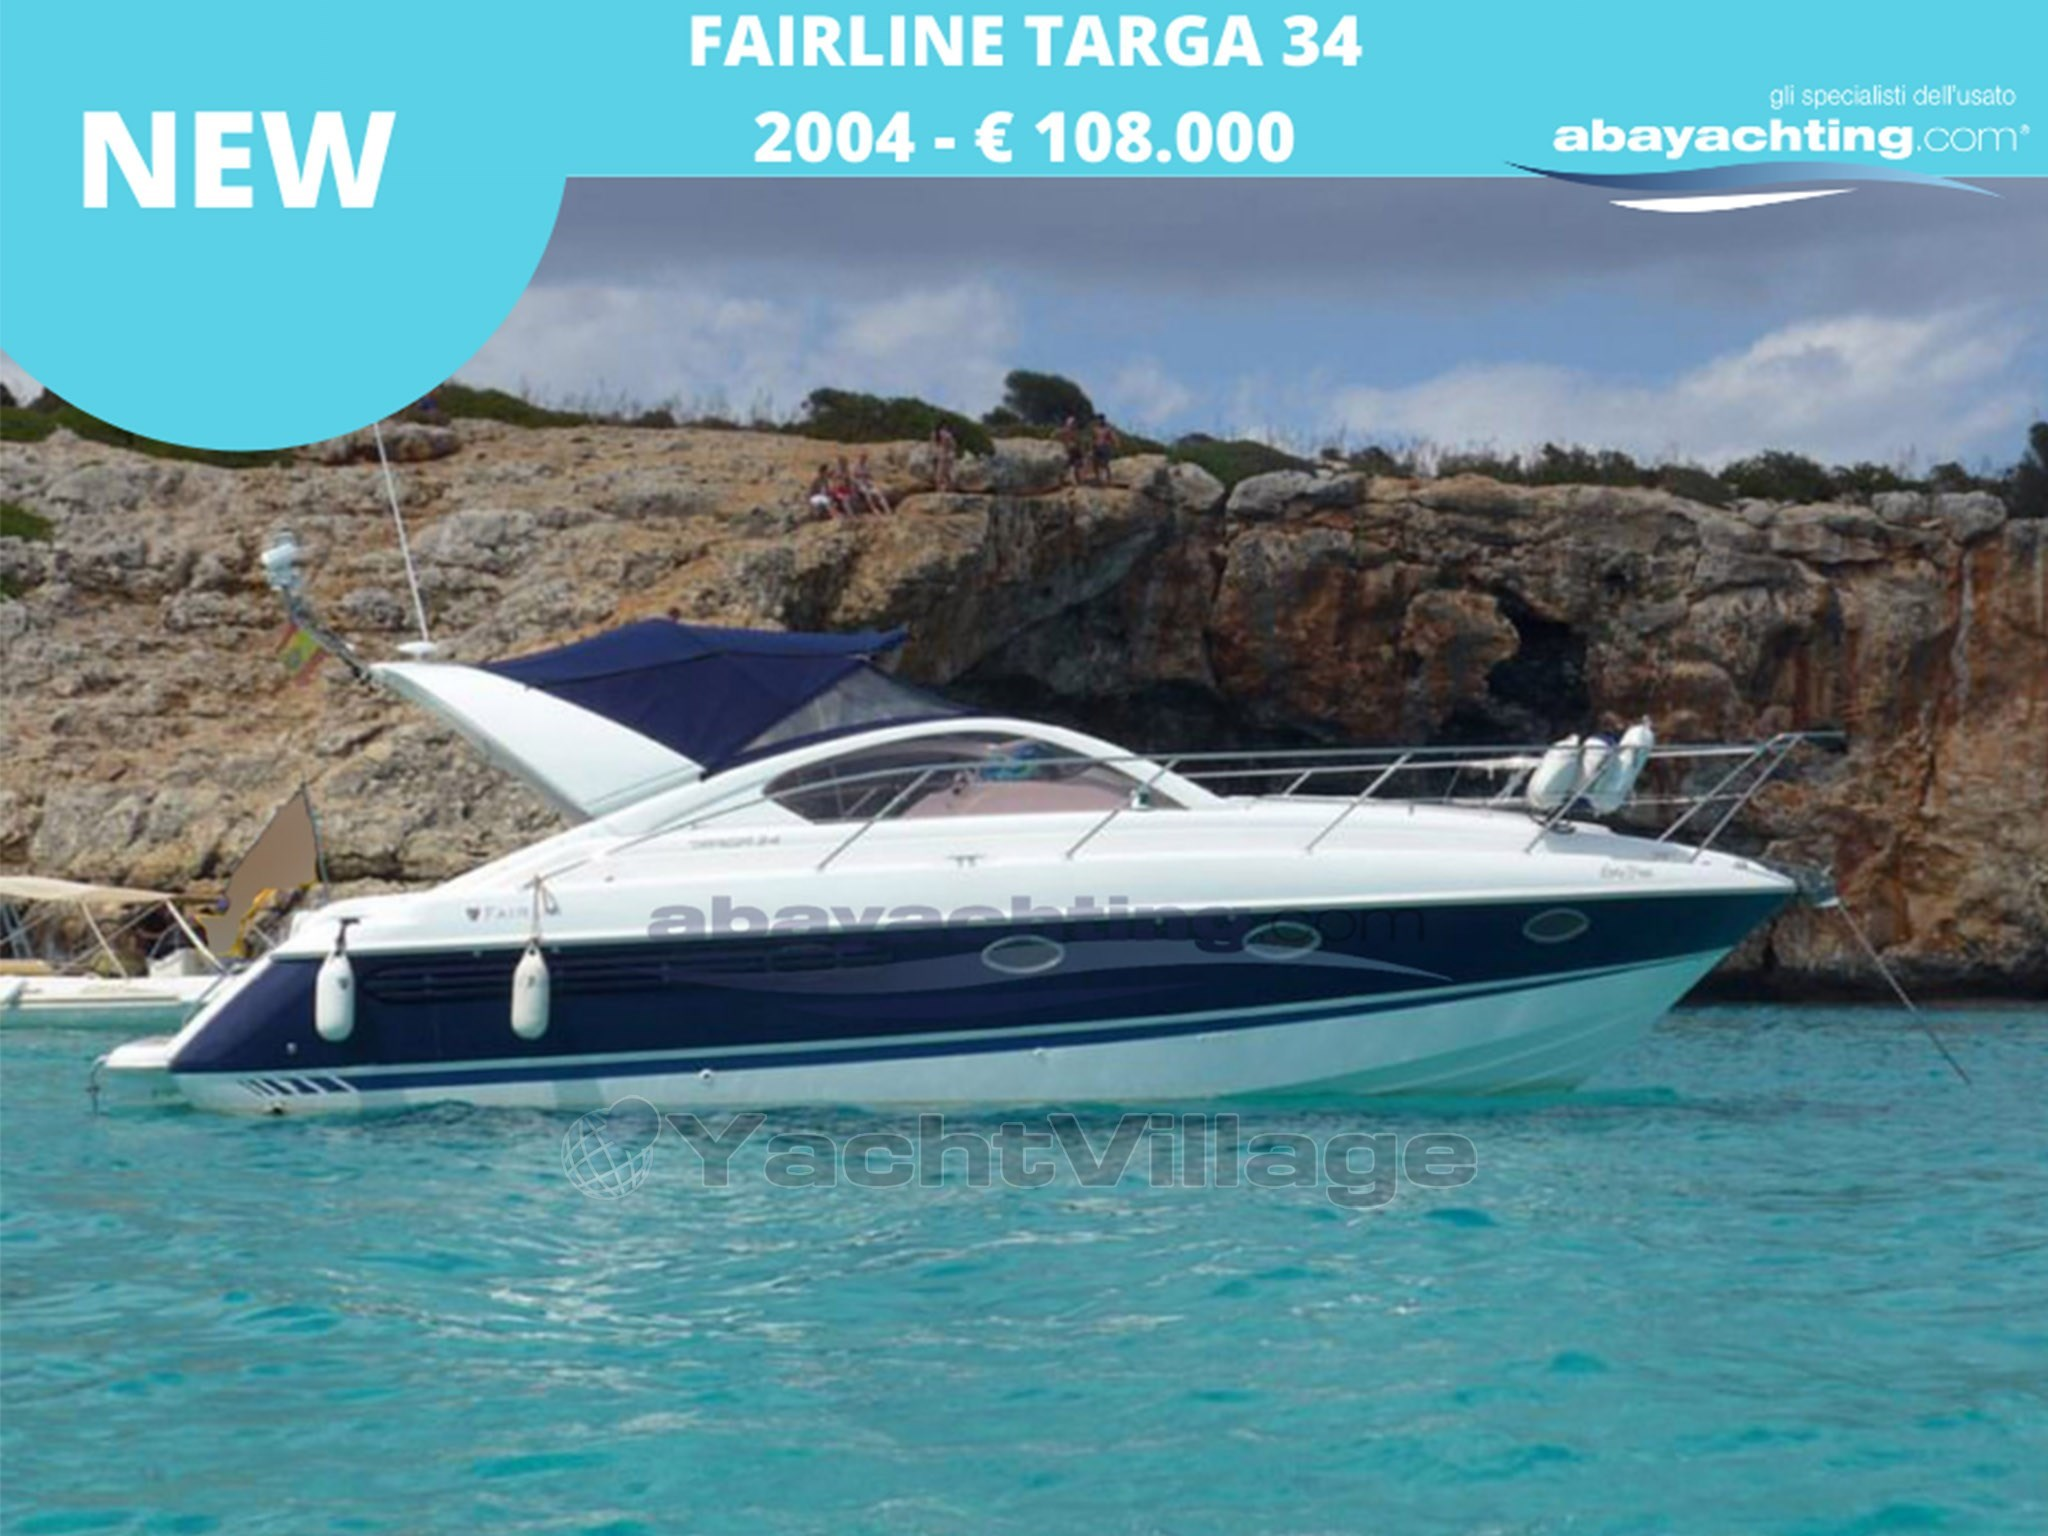 Abayachting Nuovo arrivo Fairline Targa 34